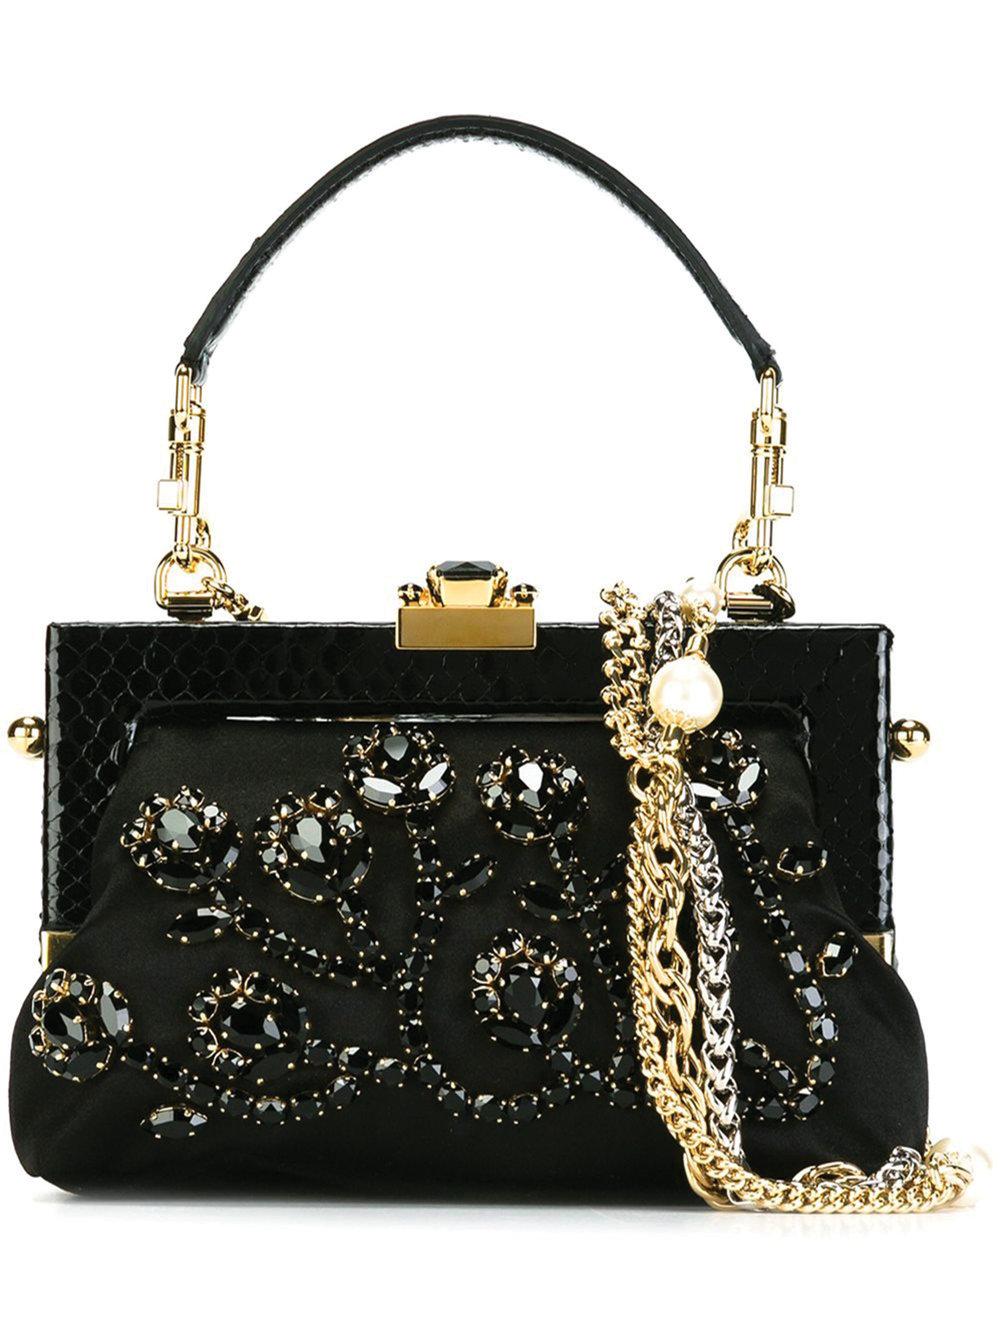 5.Vanda Clutch by Dolce & Gabbana $4,857, farfetch.ca